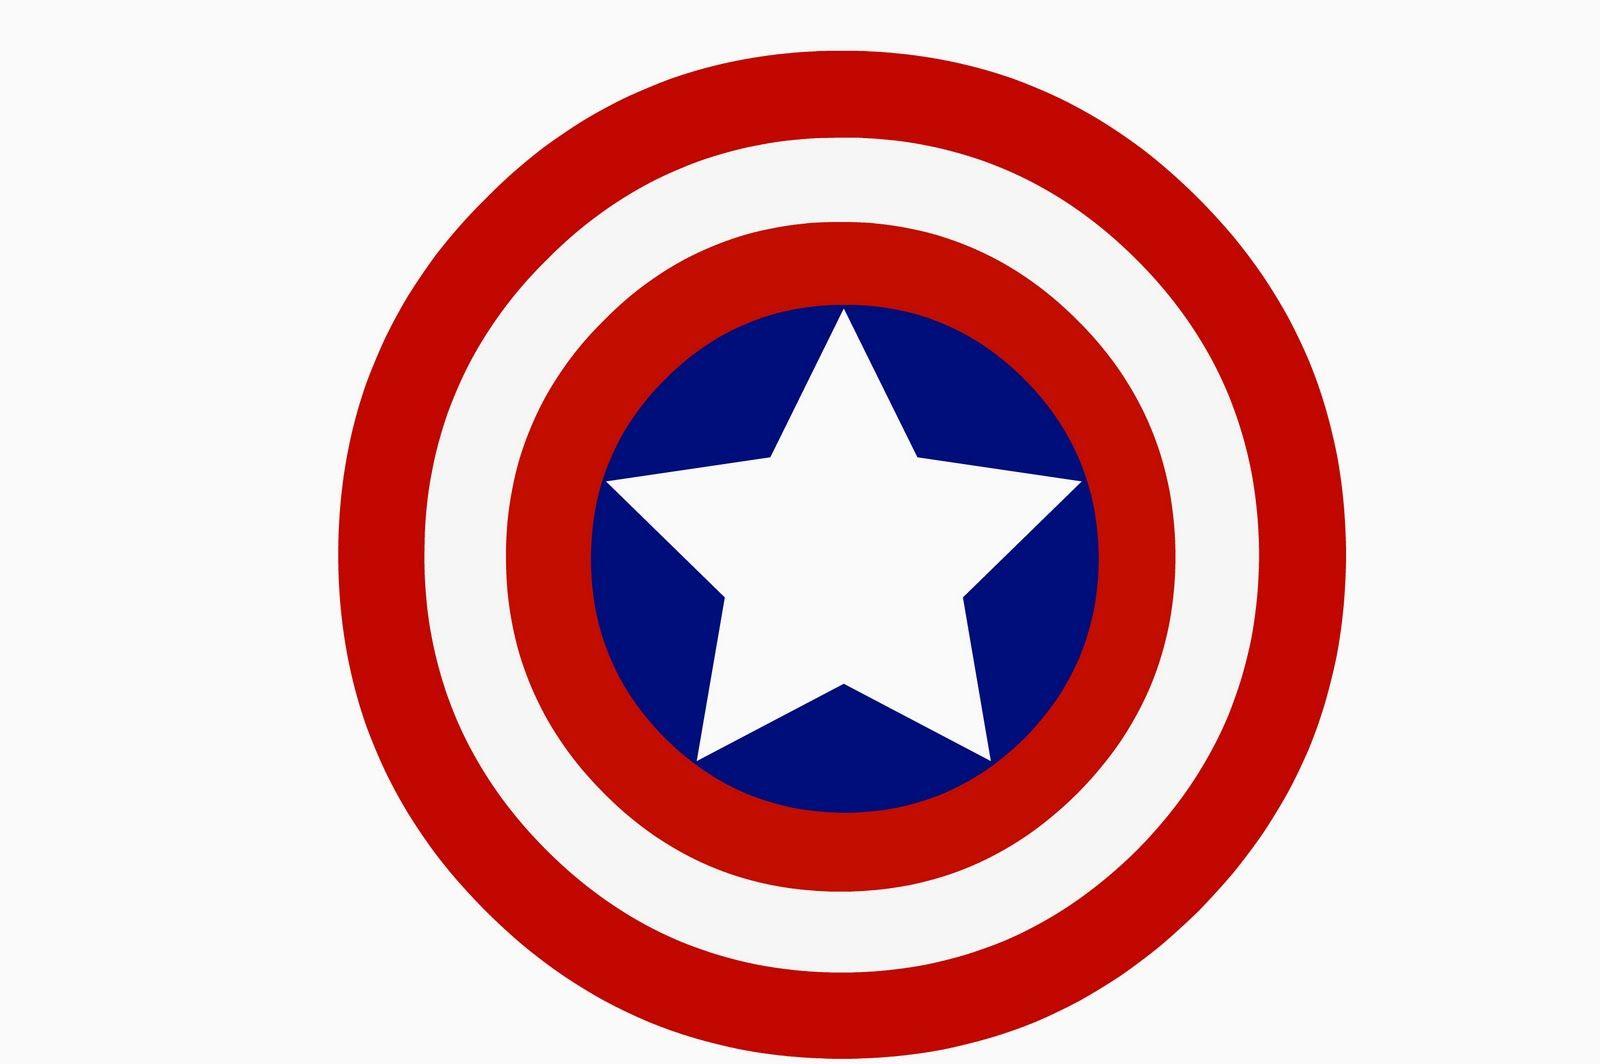 captain america logo - logo to use for \